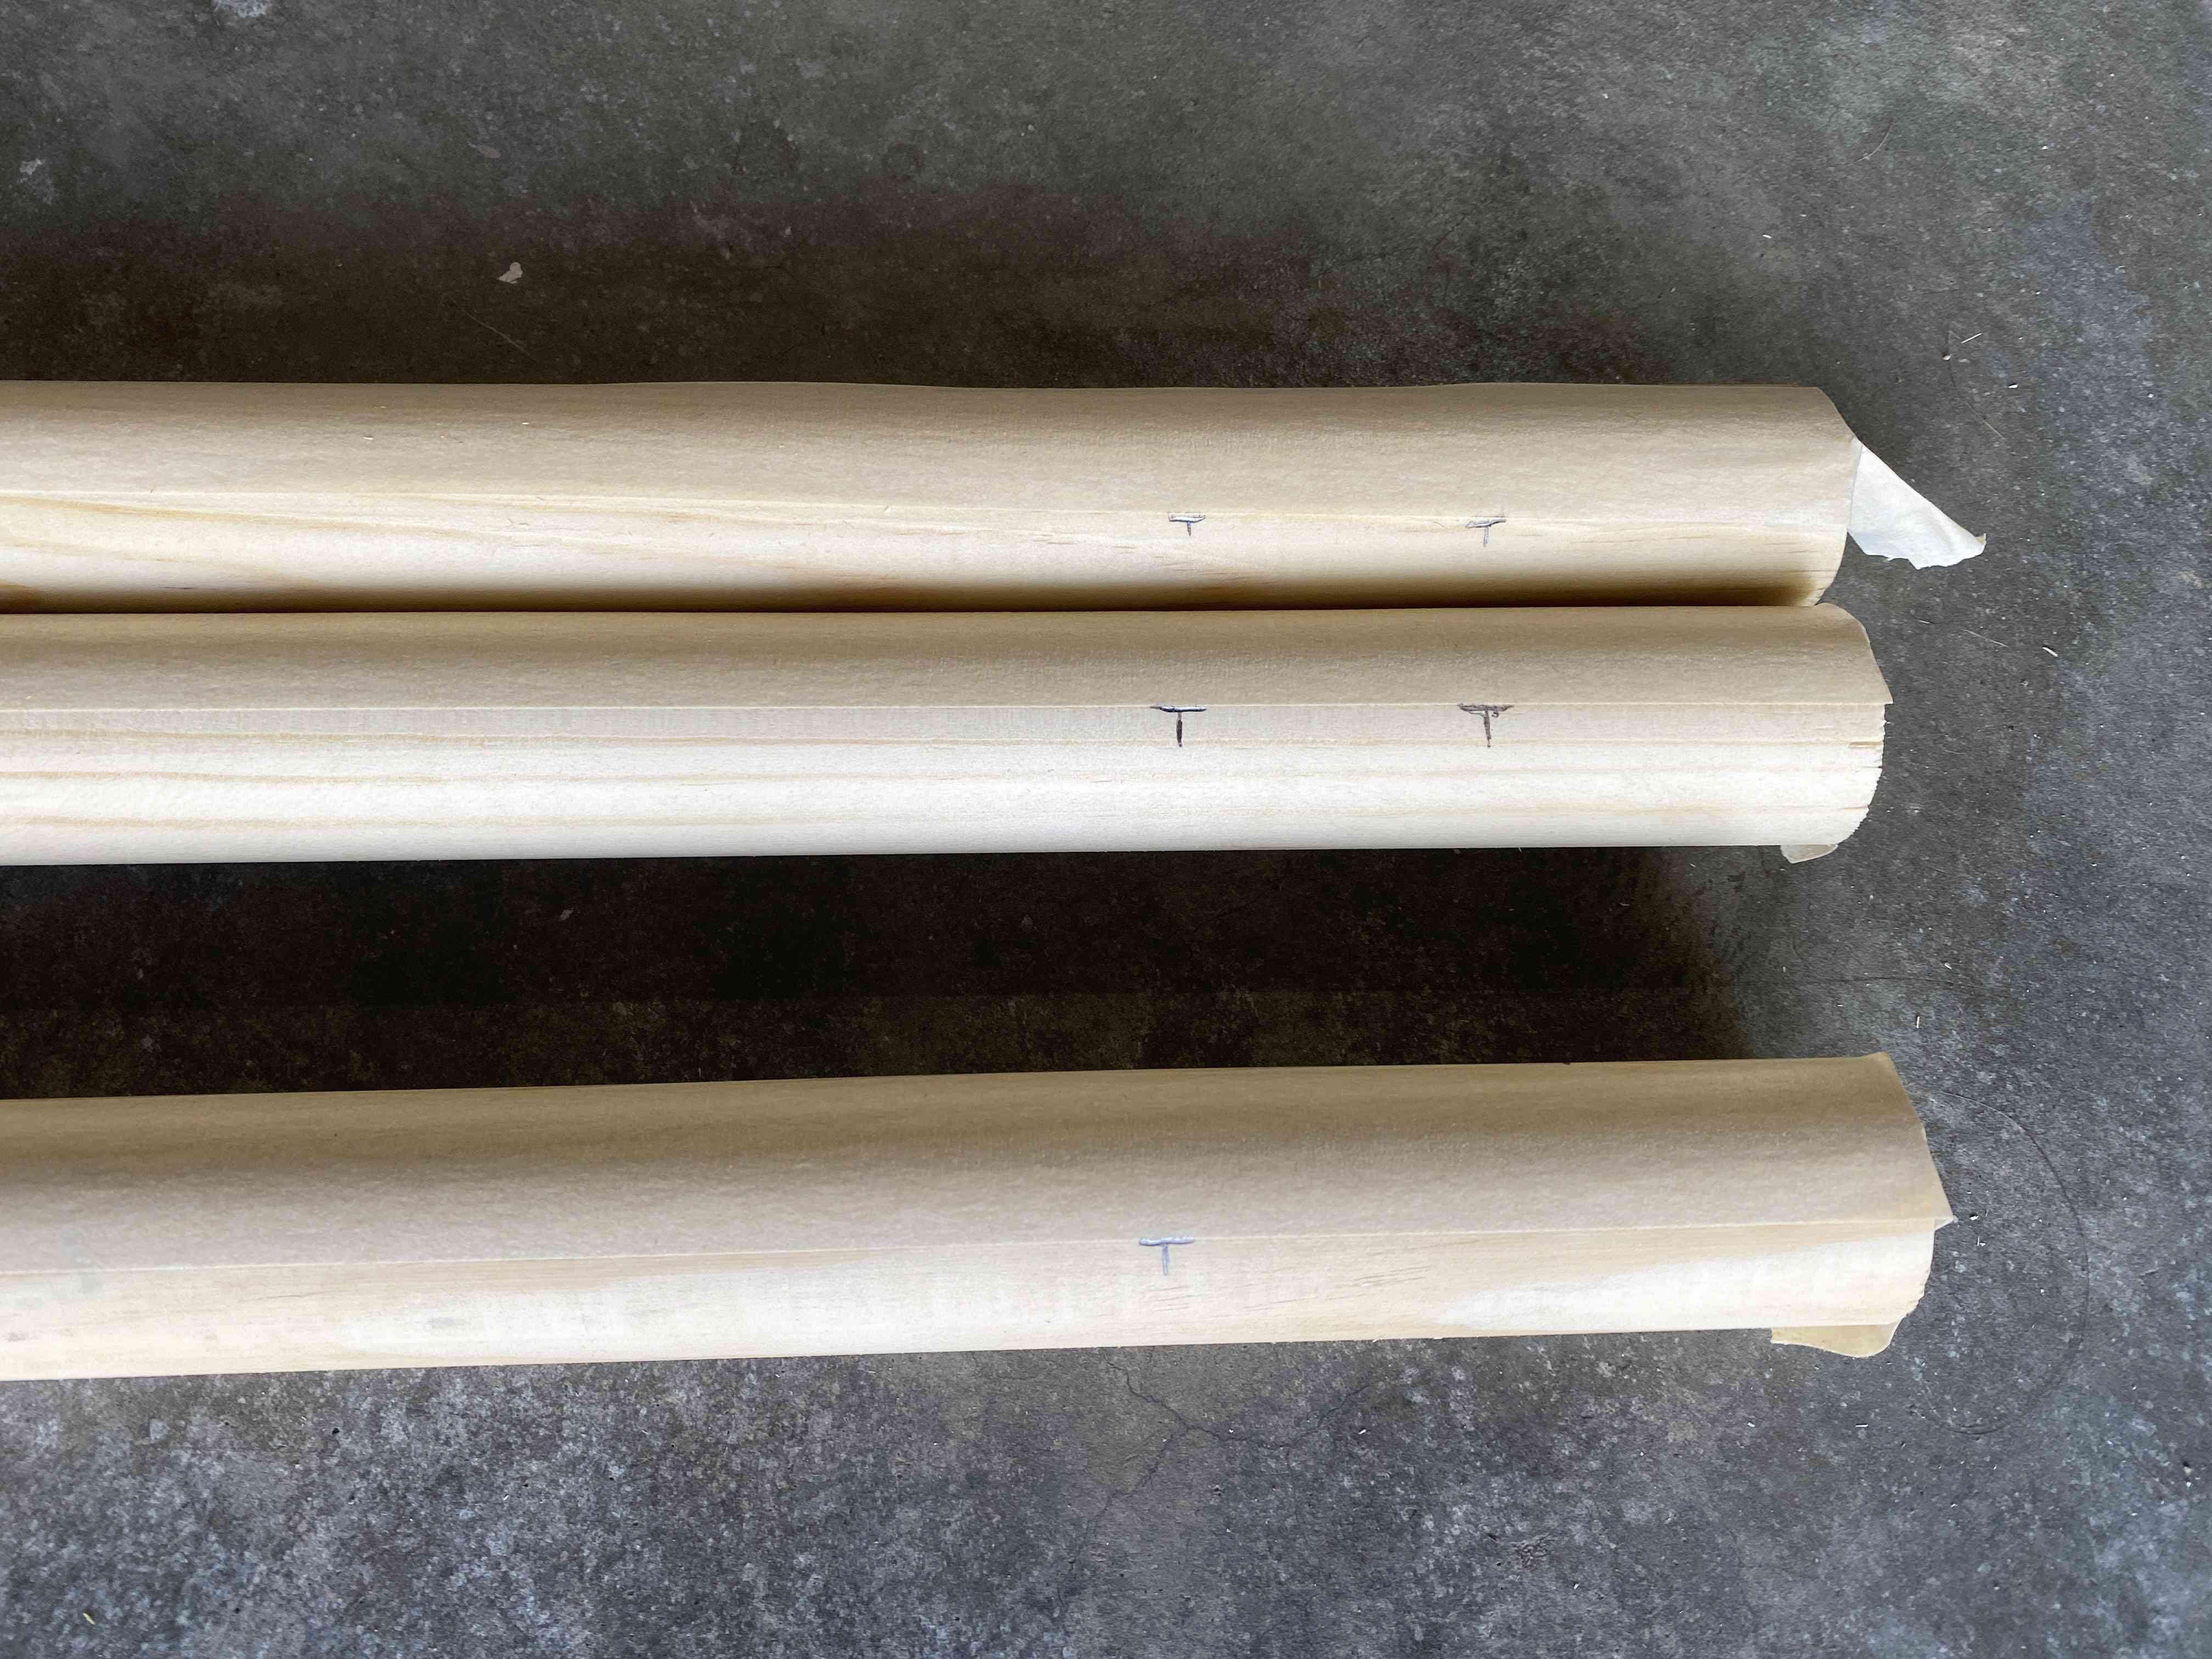 Three dowel rods marked